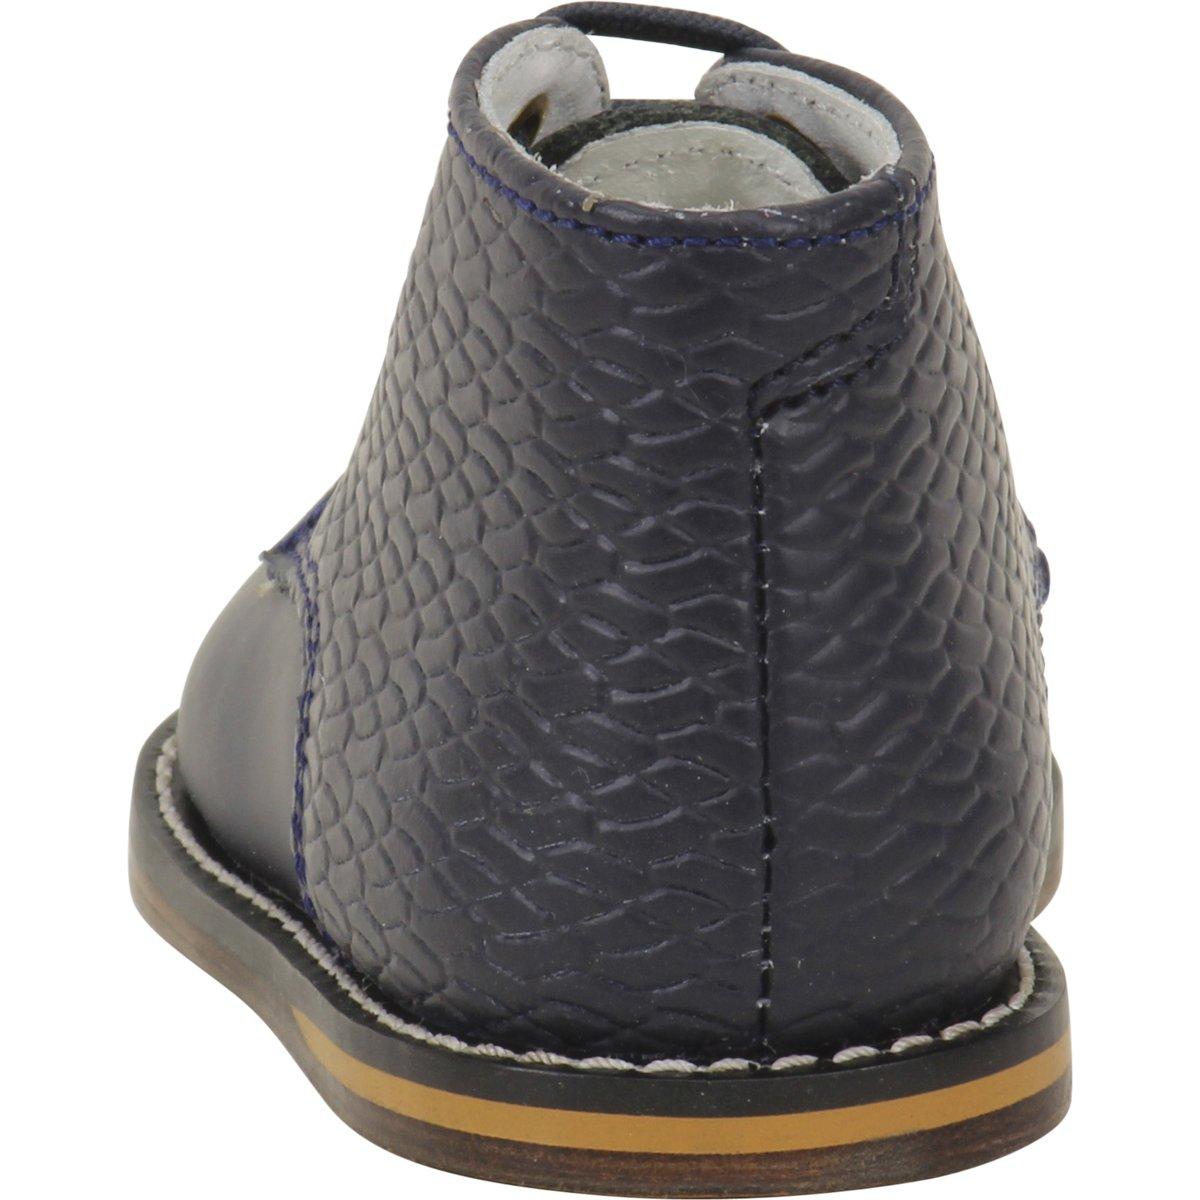 JOSMO 2-8 Woven Print Walking Shoes Navy Woven, 4